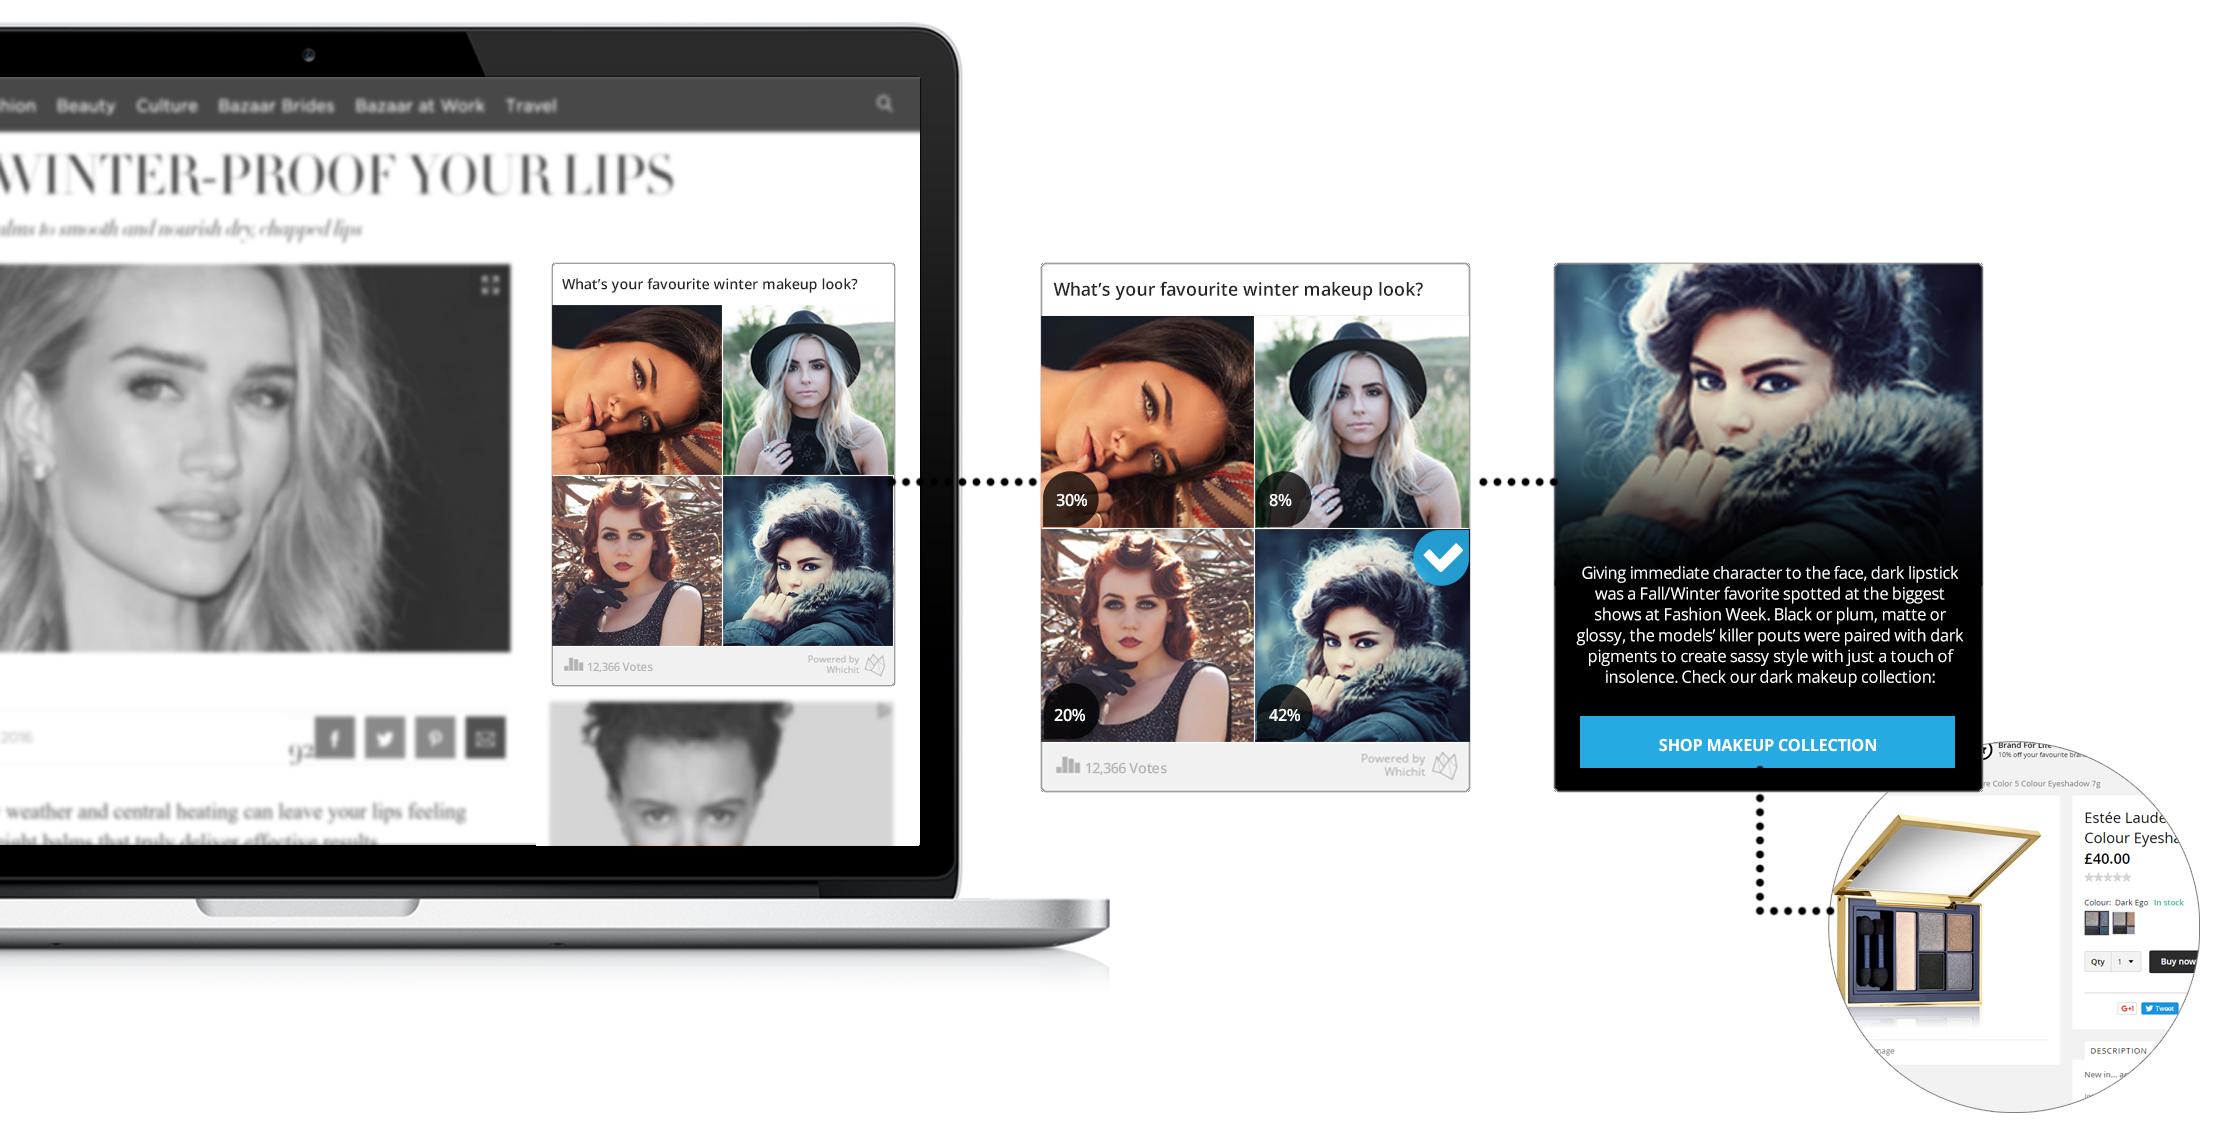 interactive marketing campaigns